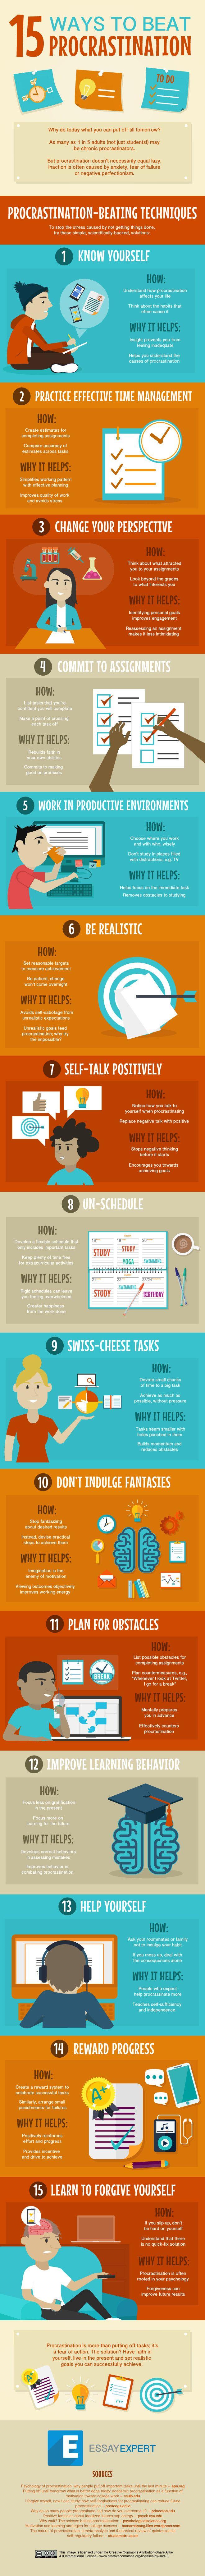 15 Ways to Beat Procrastination #infographic #Procrastination